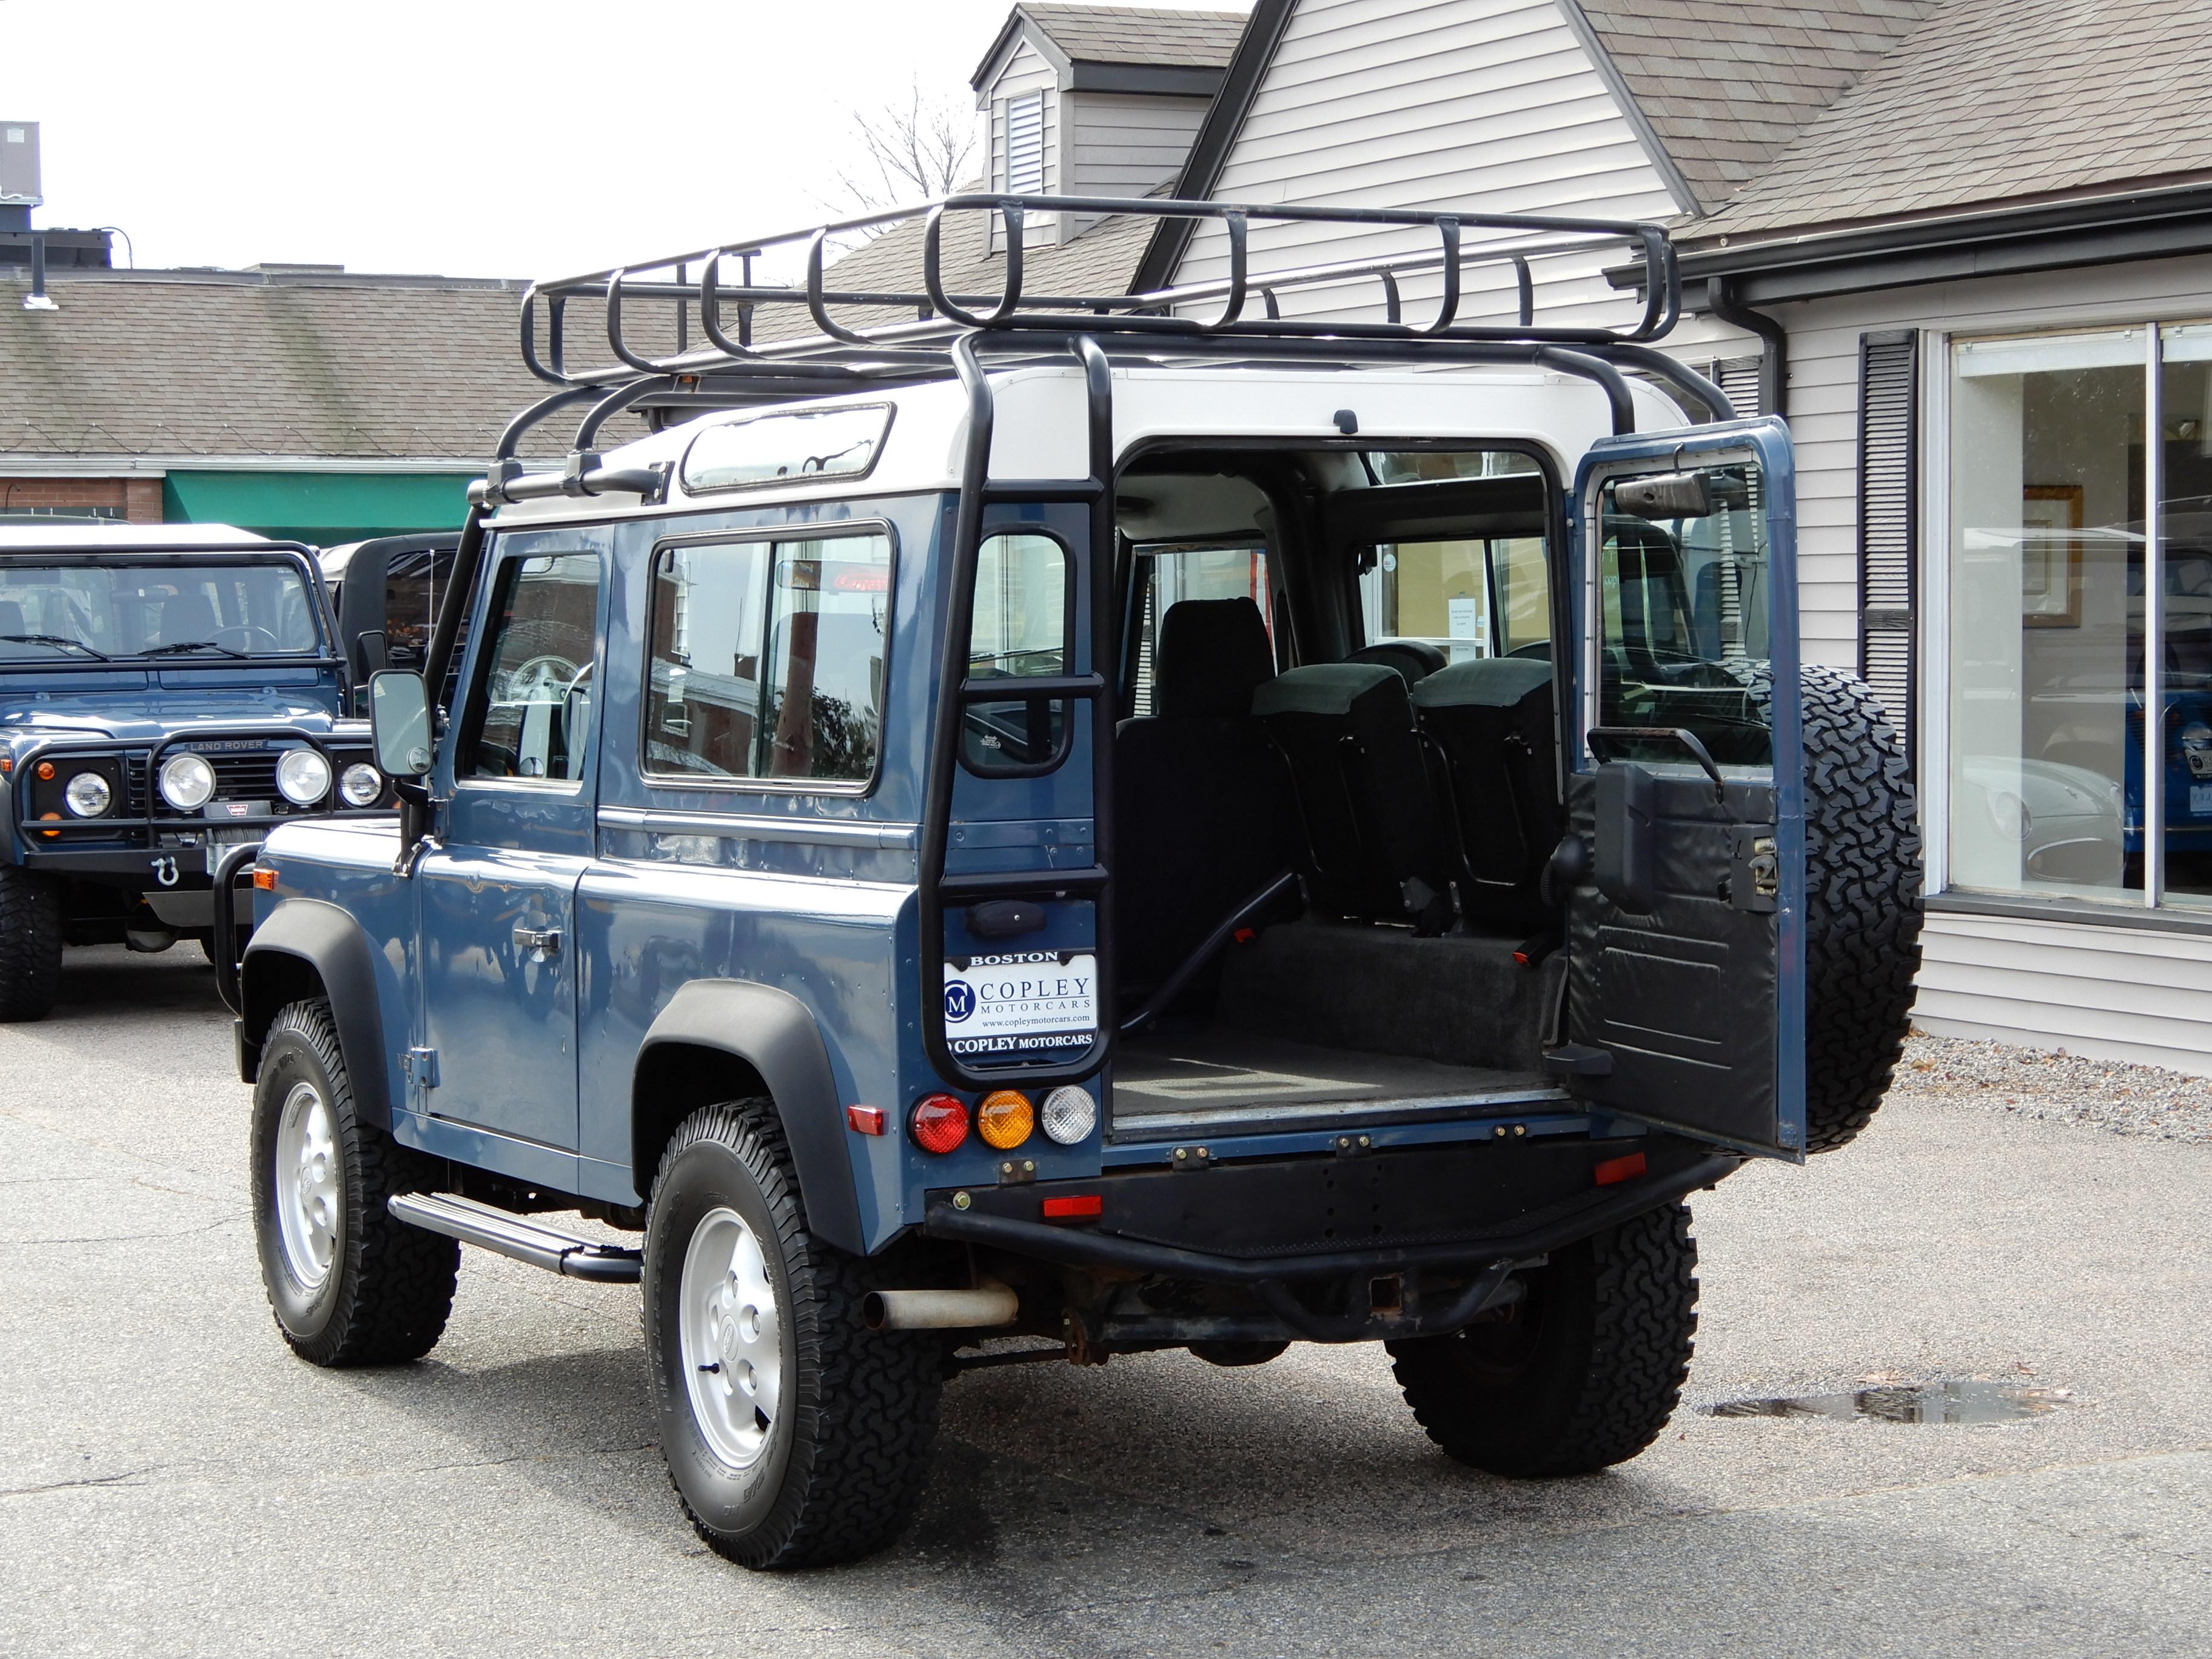 1995 Land Rover Defender 90 station wagon 256 500